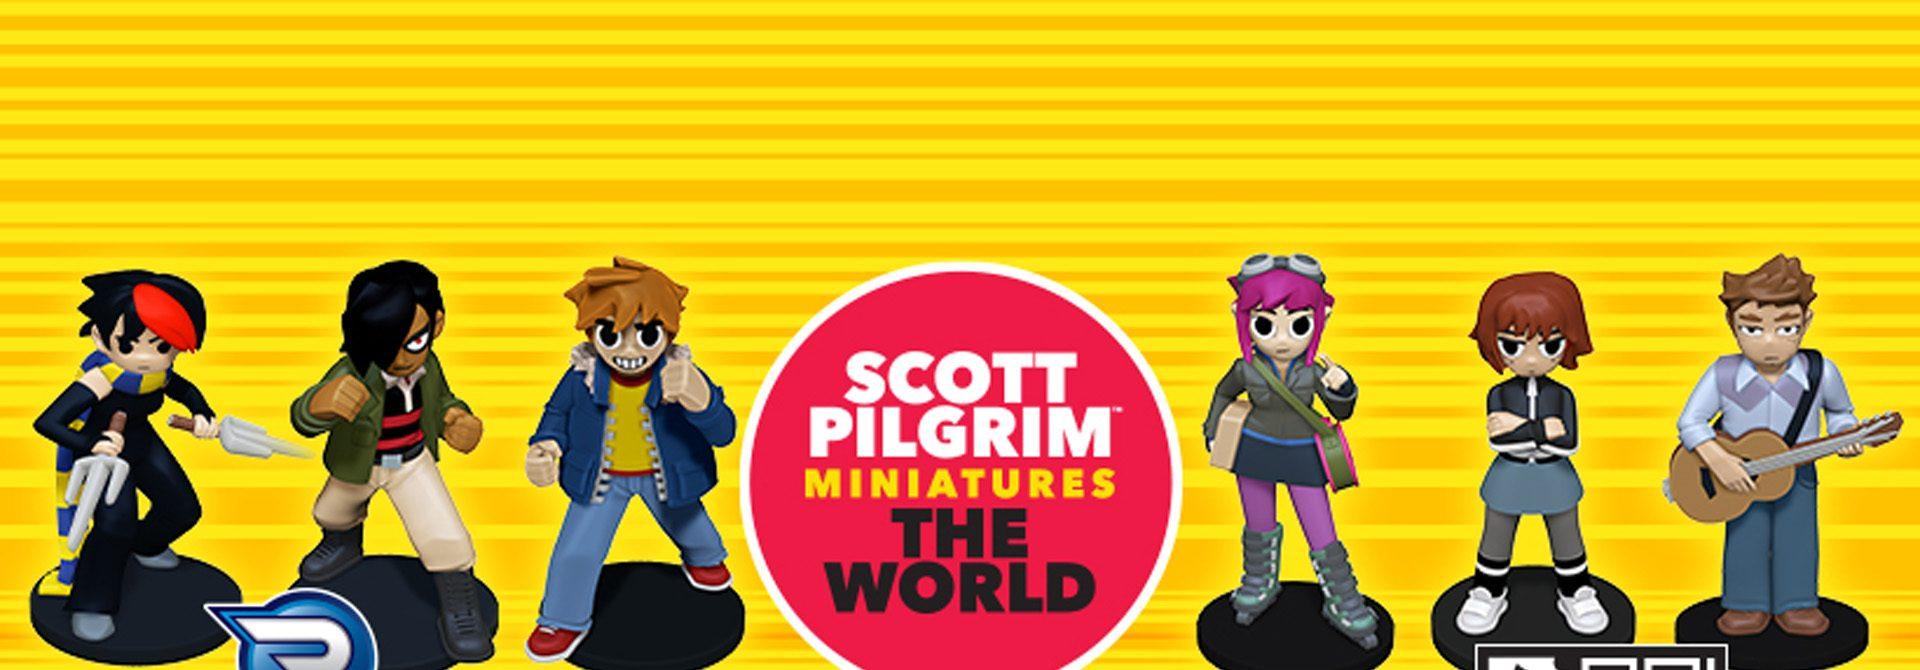 Scott Pilgrim Miniatures The World Heads To Retail